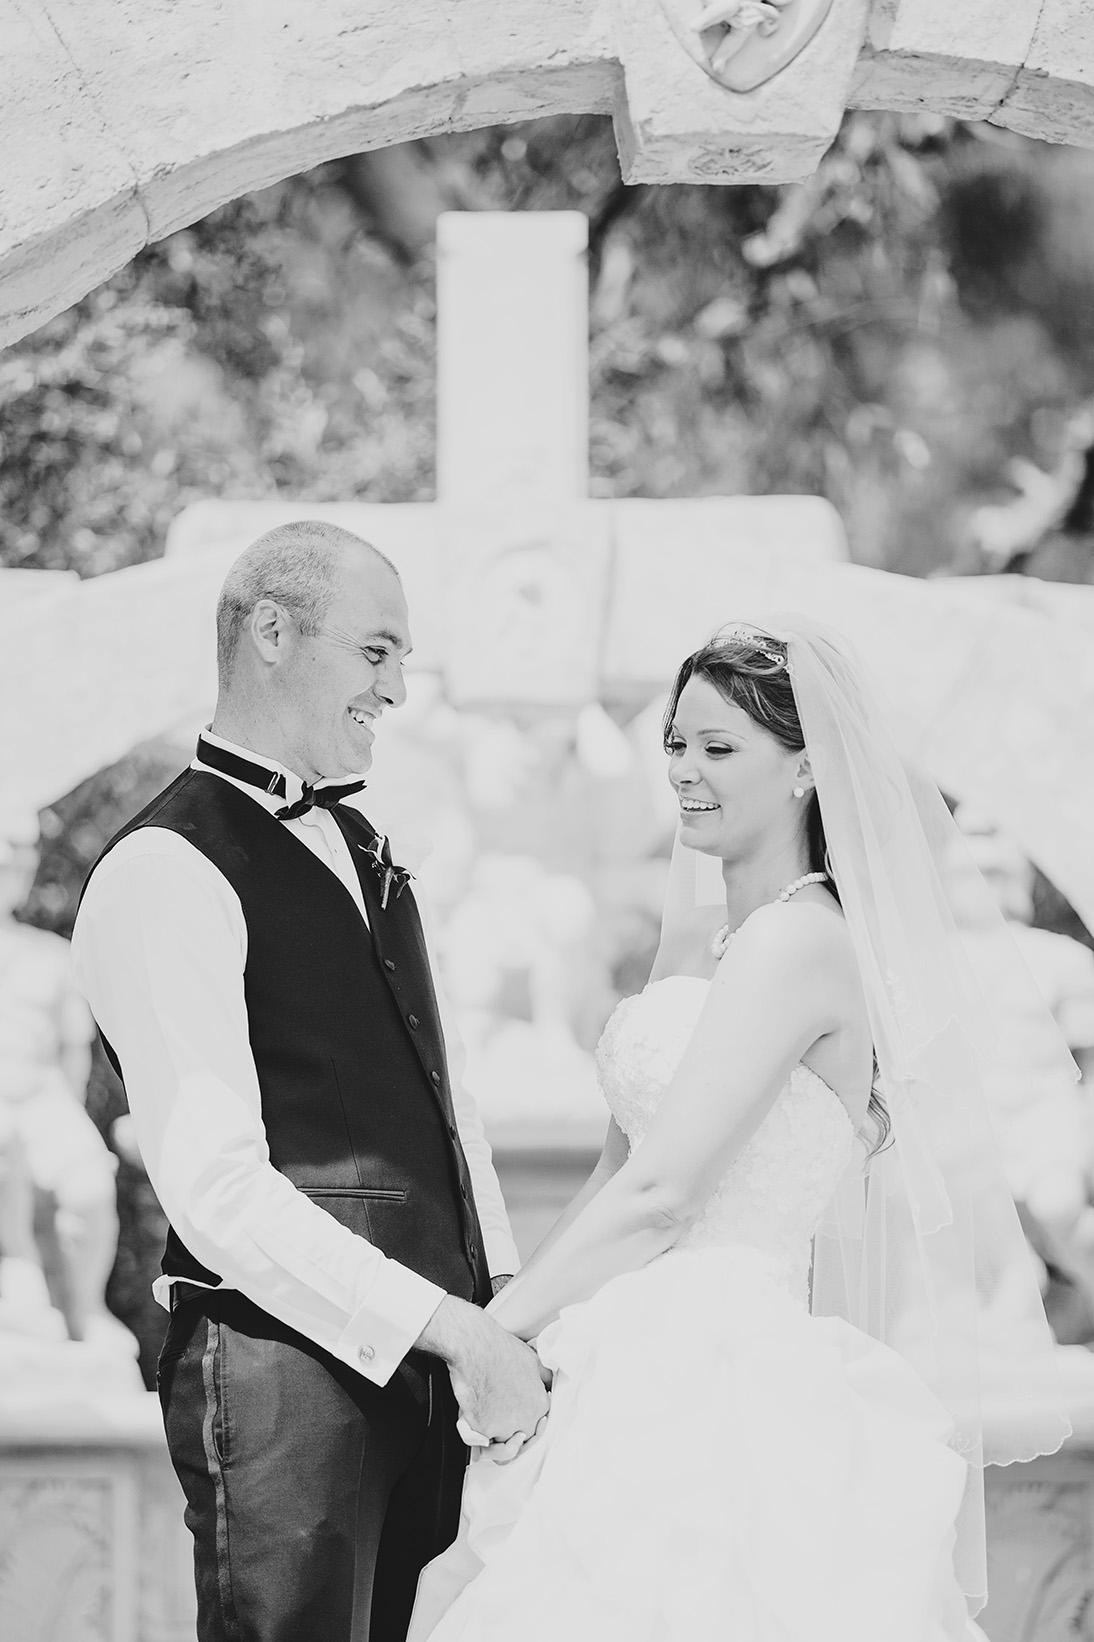 One Tree Hill Wedding Photography Art Through Da Vinces Eyes 09.jpg